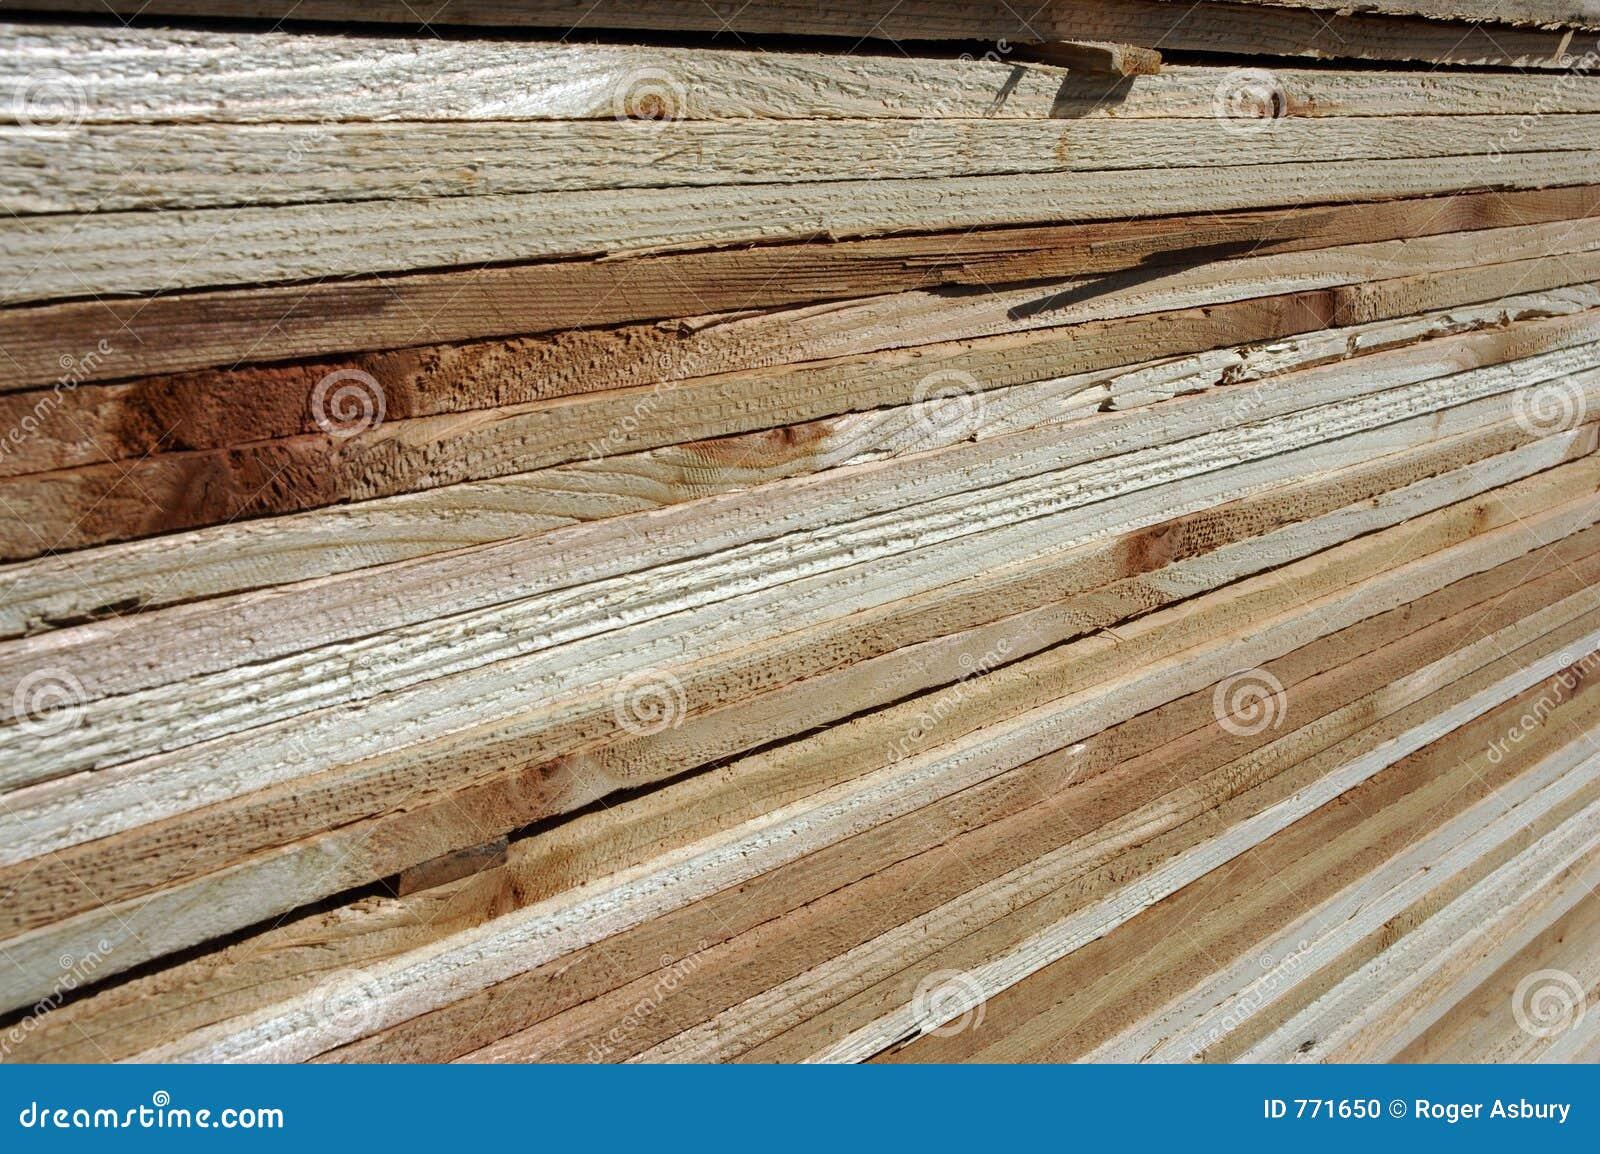 Garage door repair clipart - Wood Layers Stock Photo Image 771650